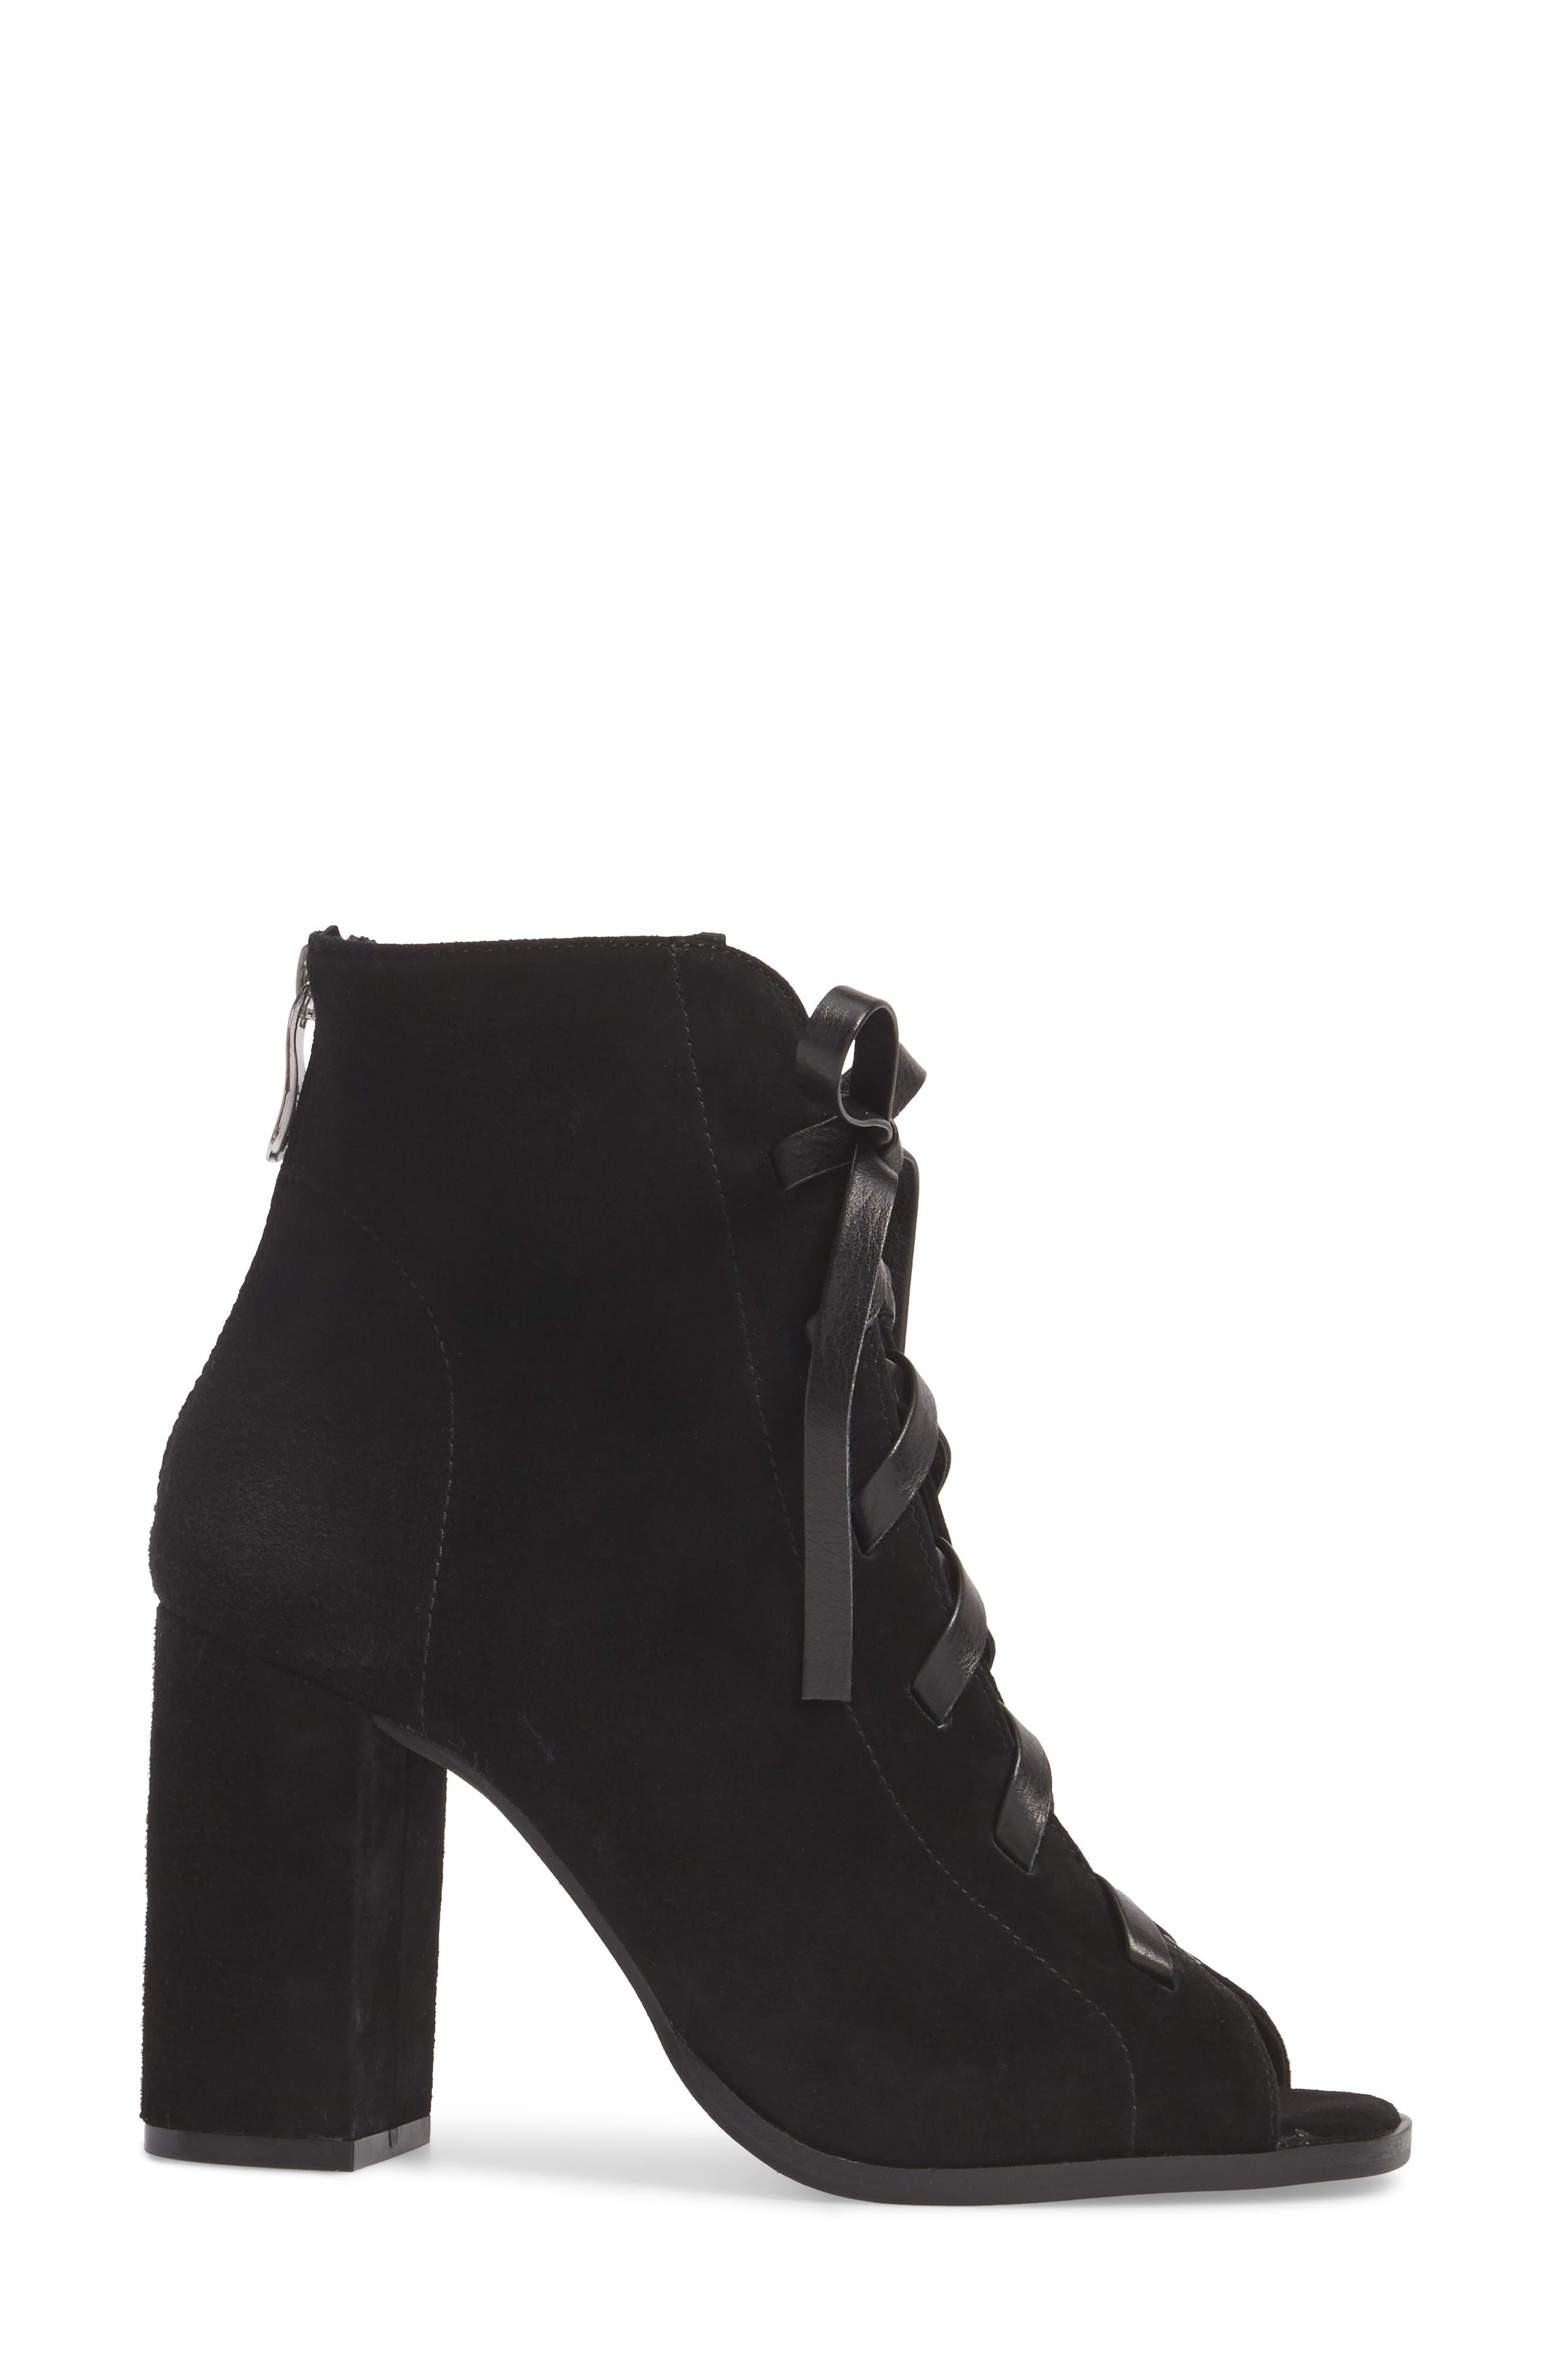 Alternate Image 3  - Kristin Cavallari Layton Lace-Up Boot (Women)